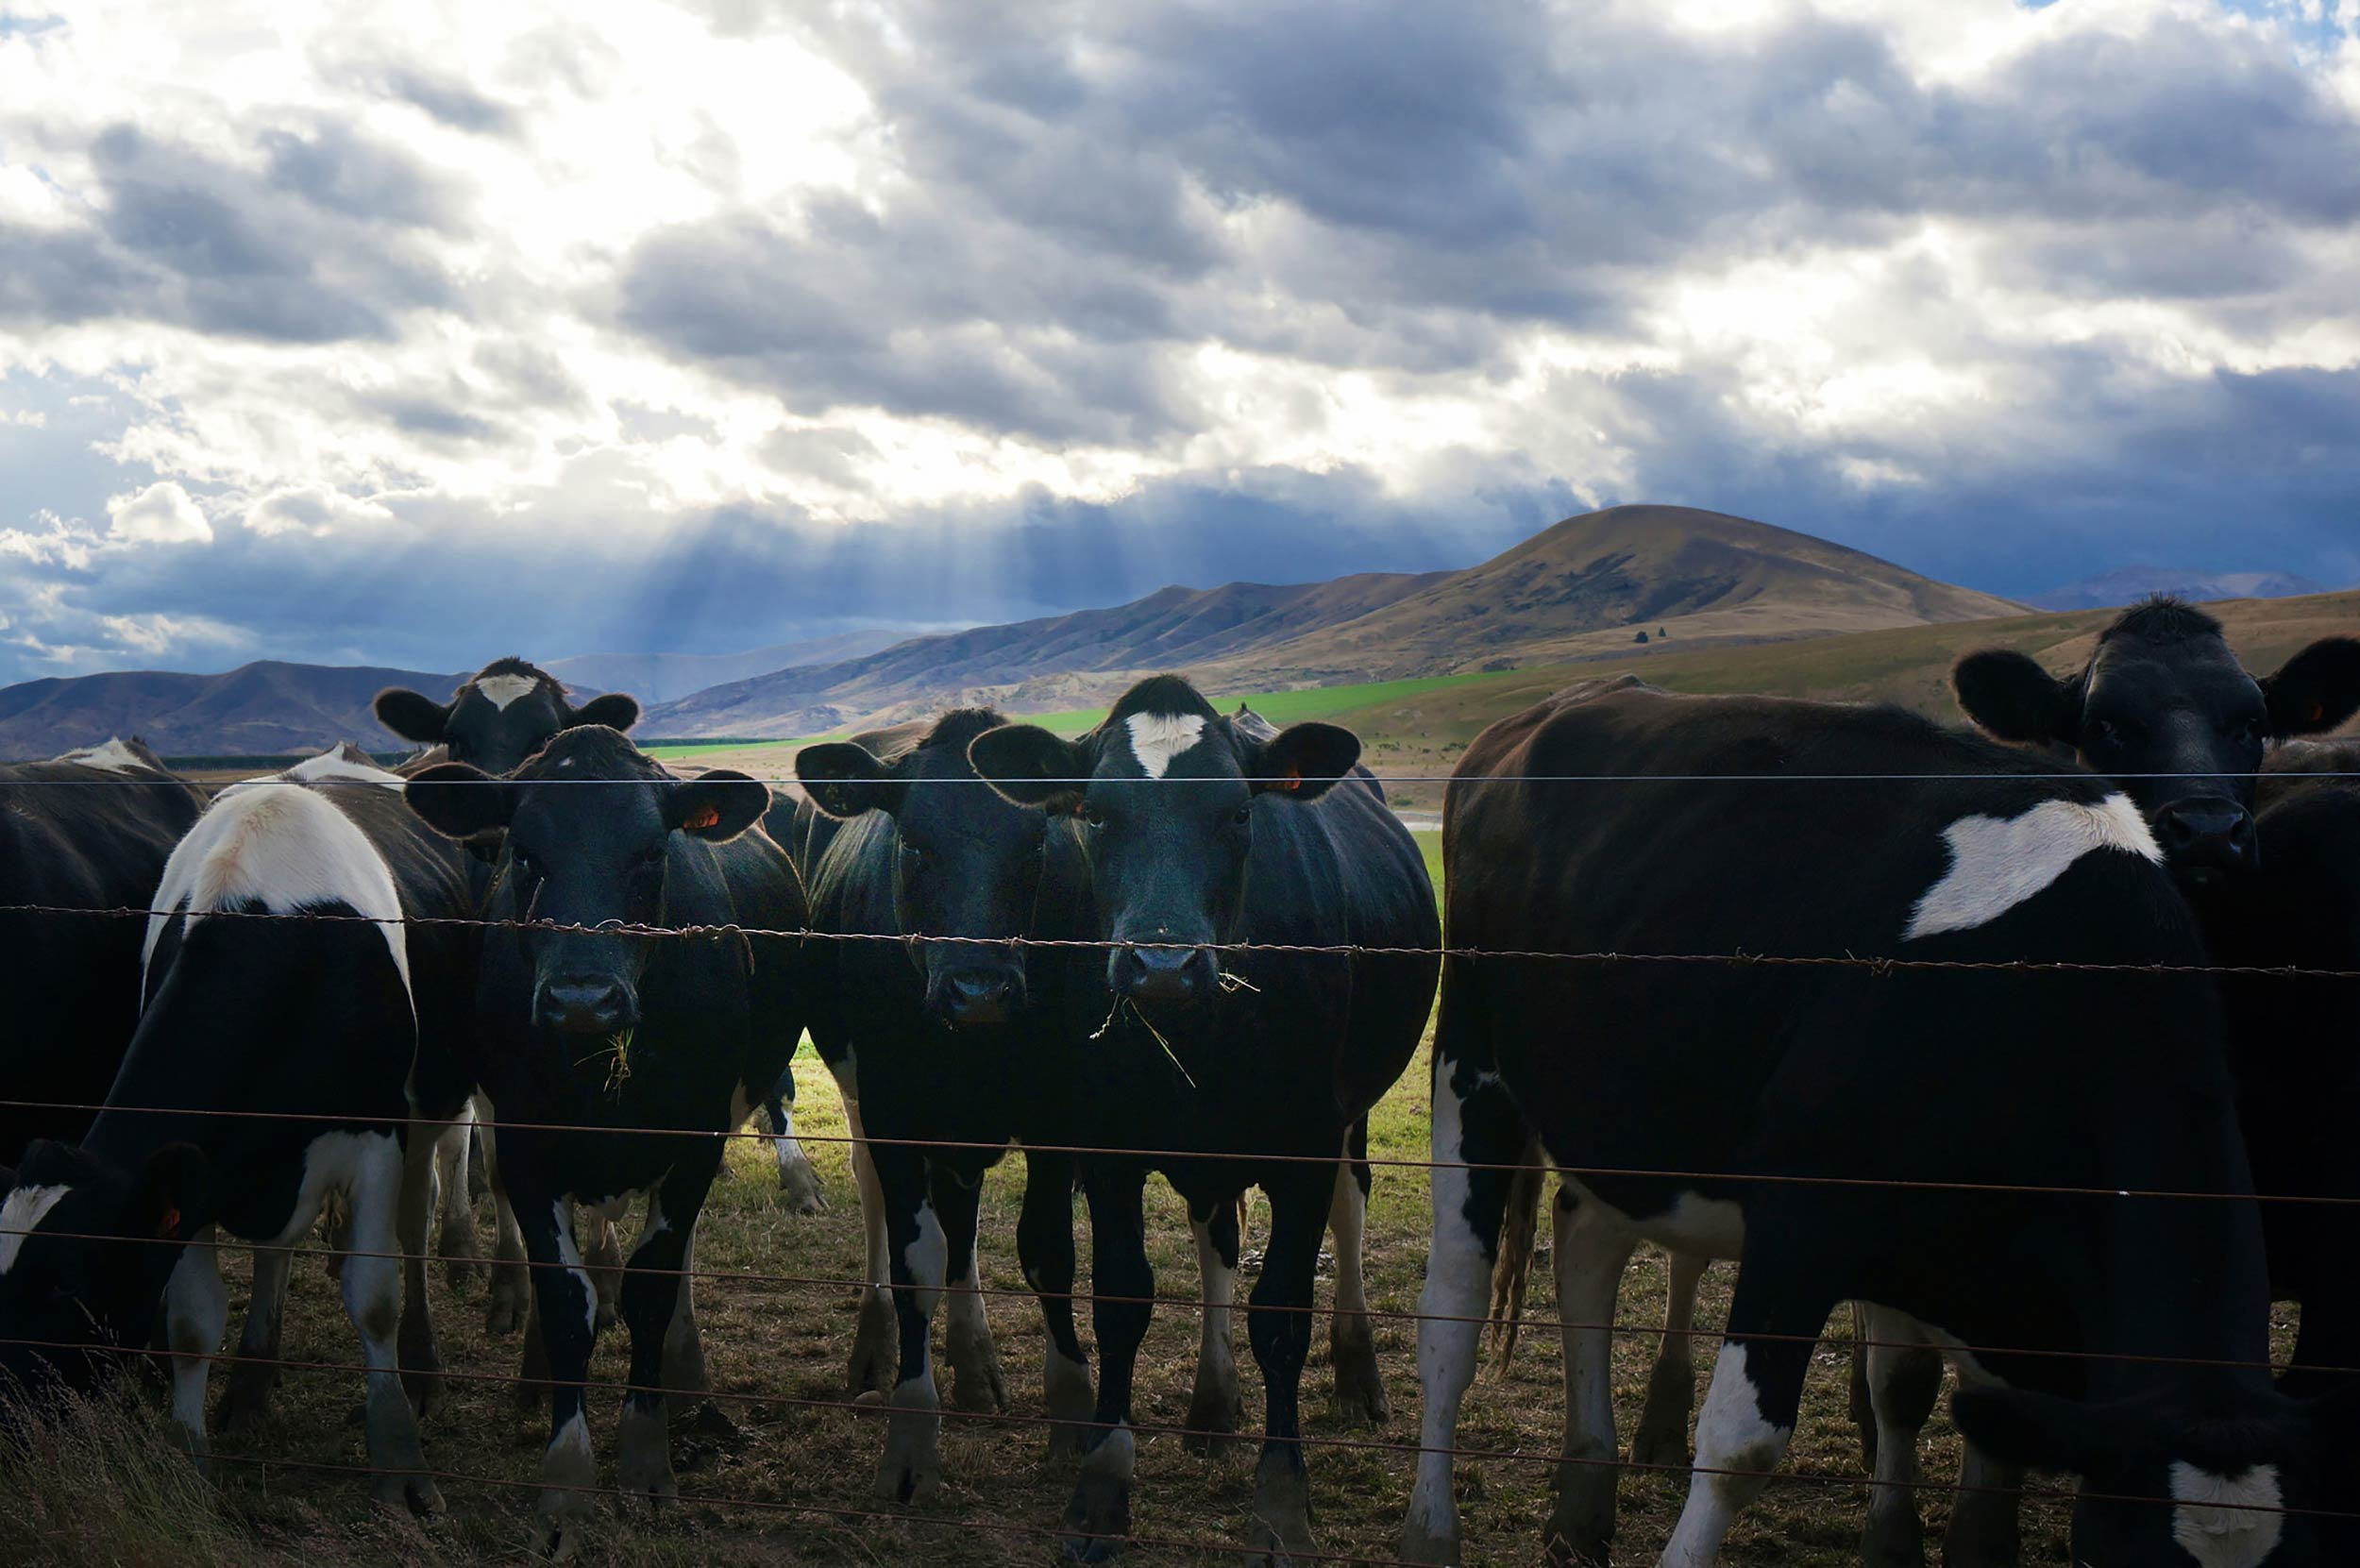 mt_cook_driving_cows_by_roadside.jpg